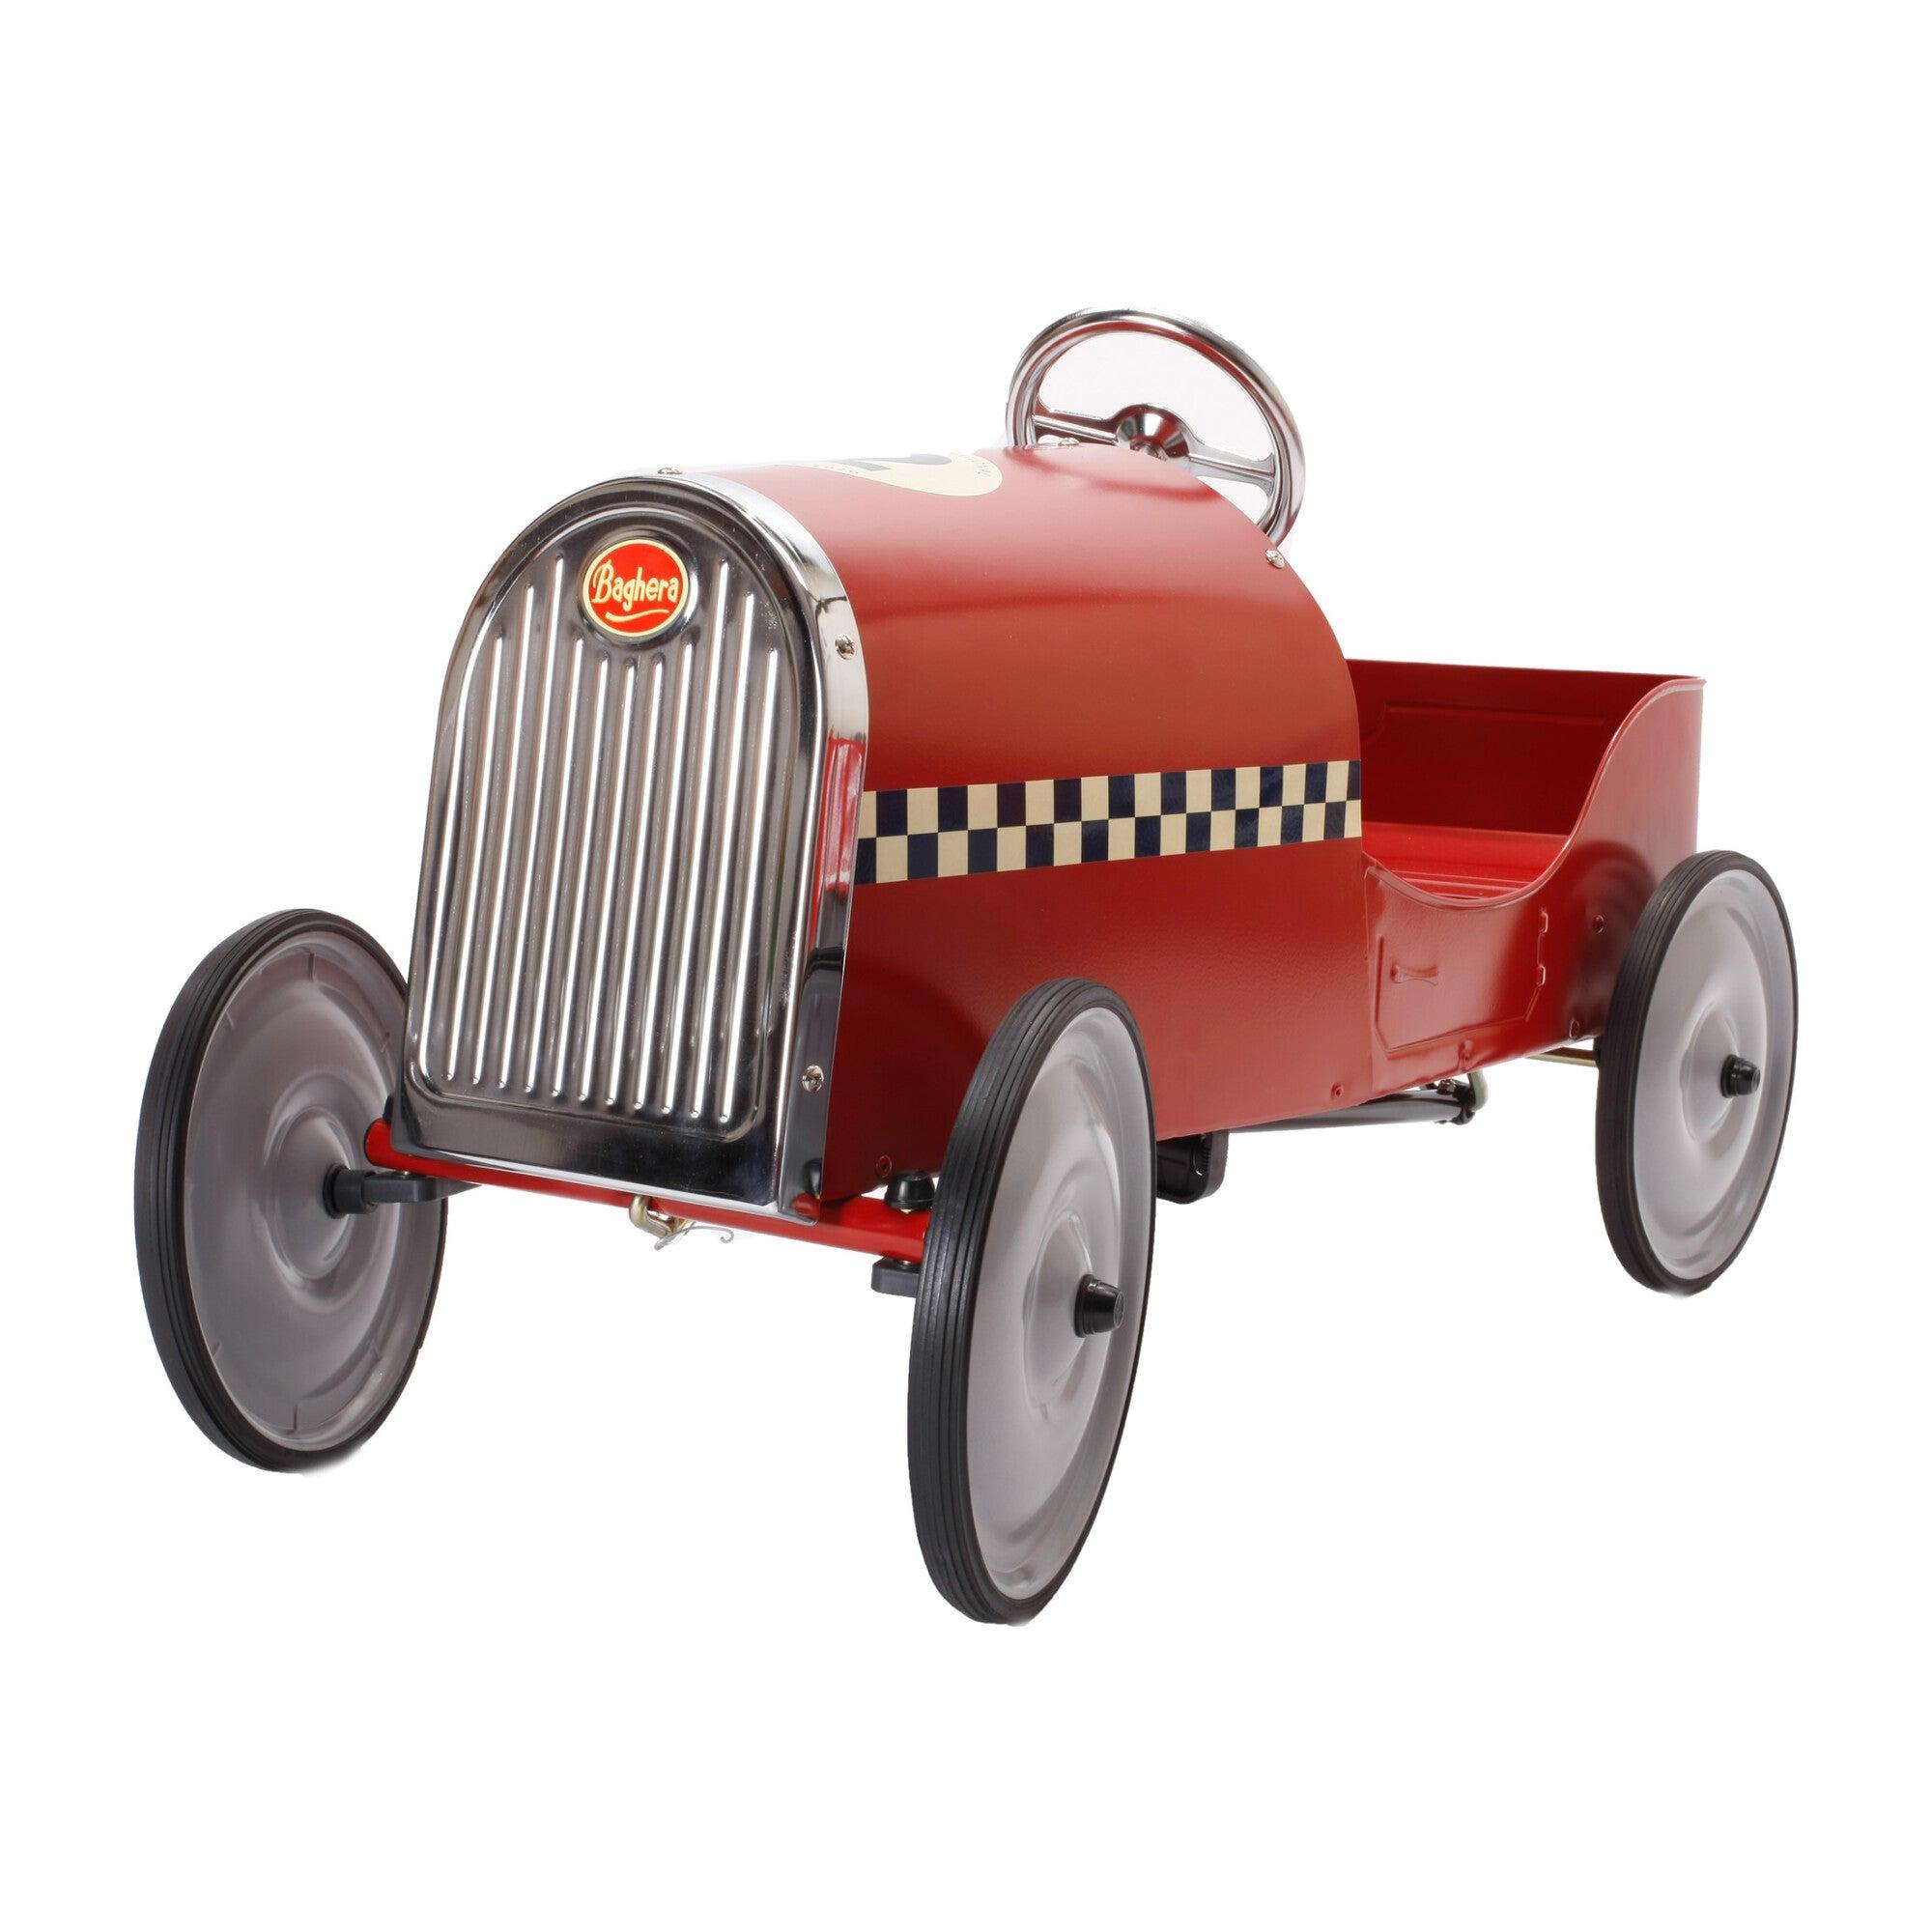 Legend Pedal Car, Red